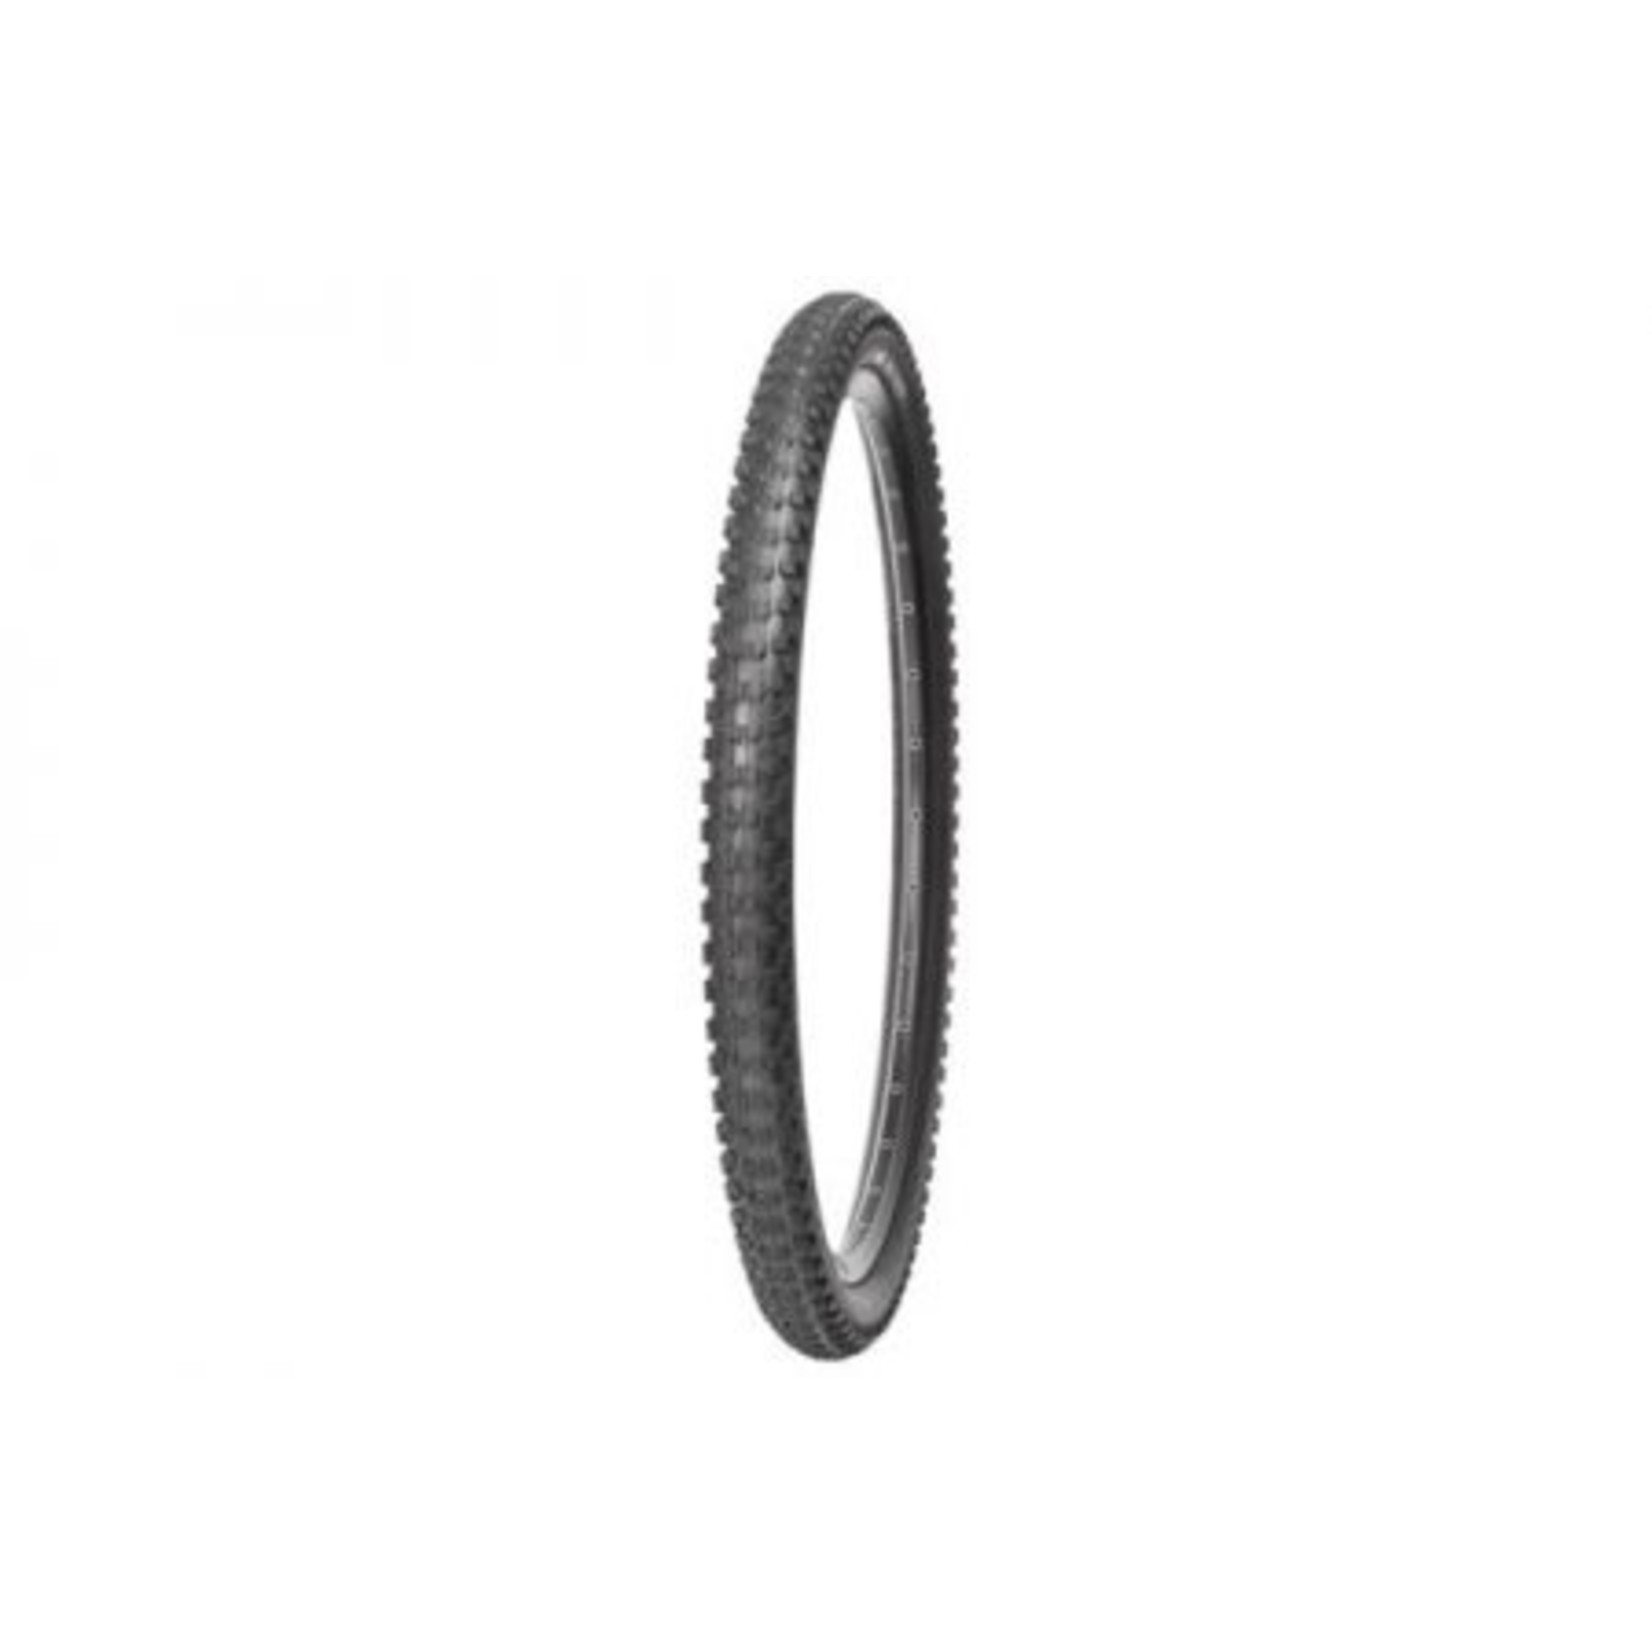 27.5 x 2.10 Mr. Robsen MTB Tyre - Black